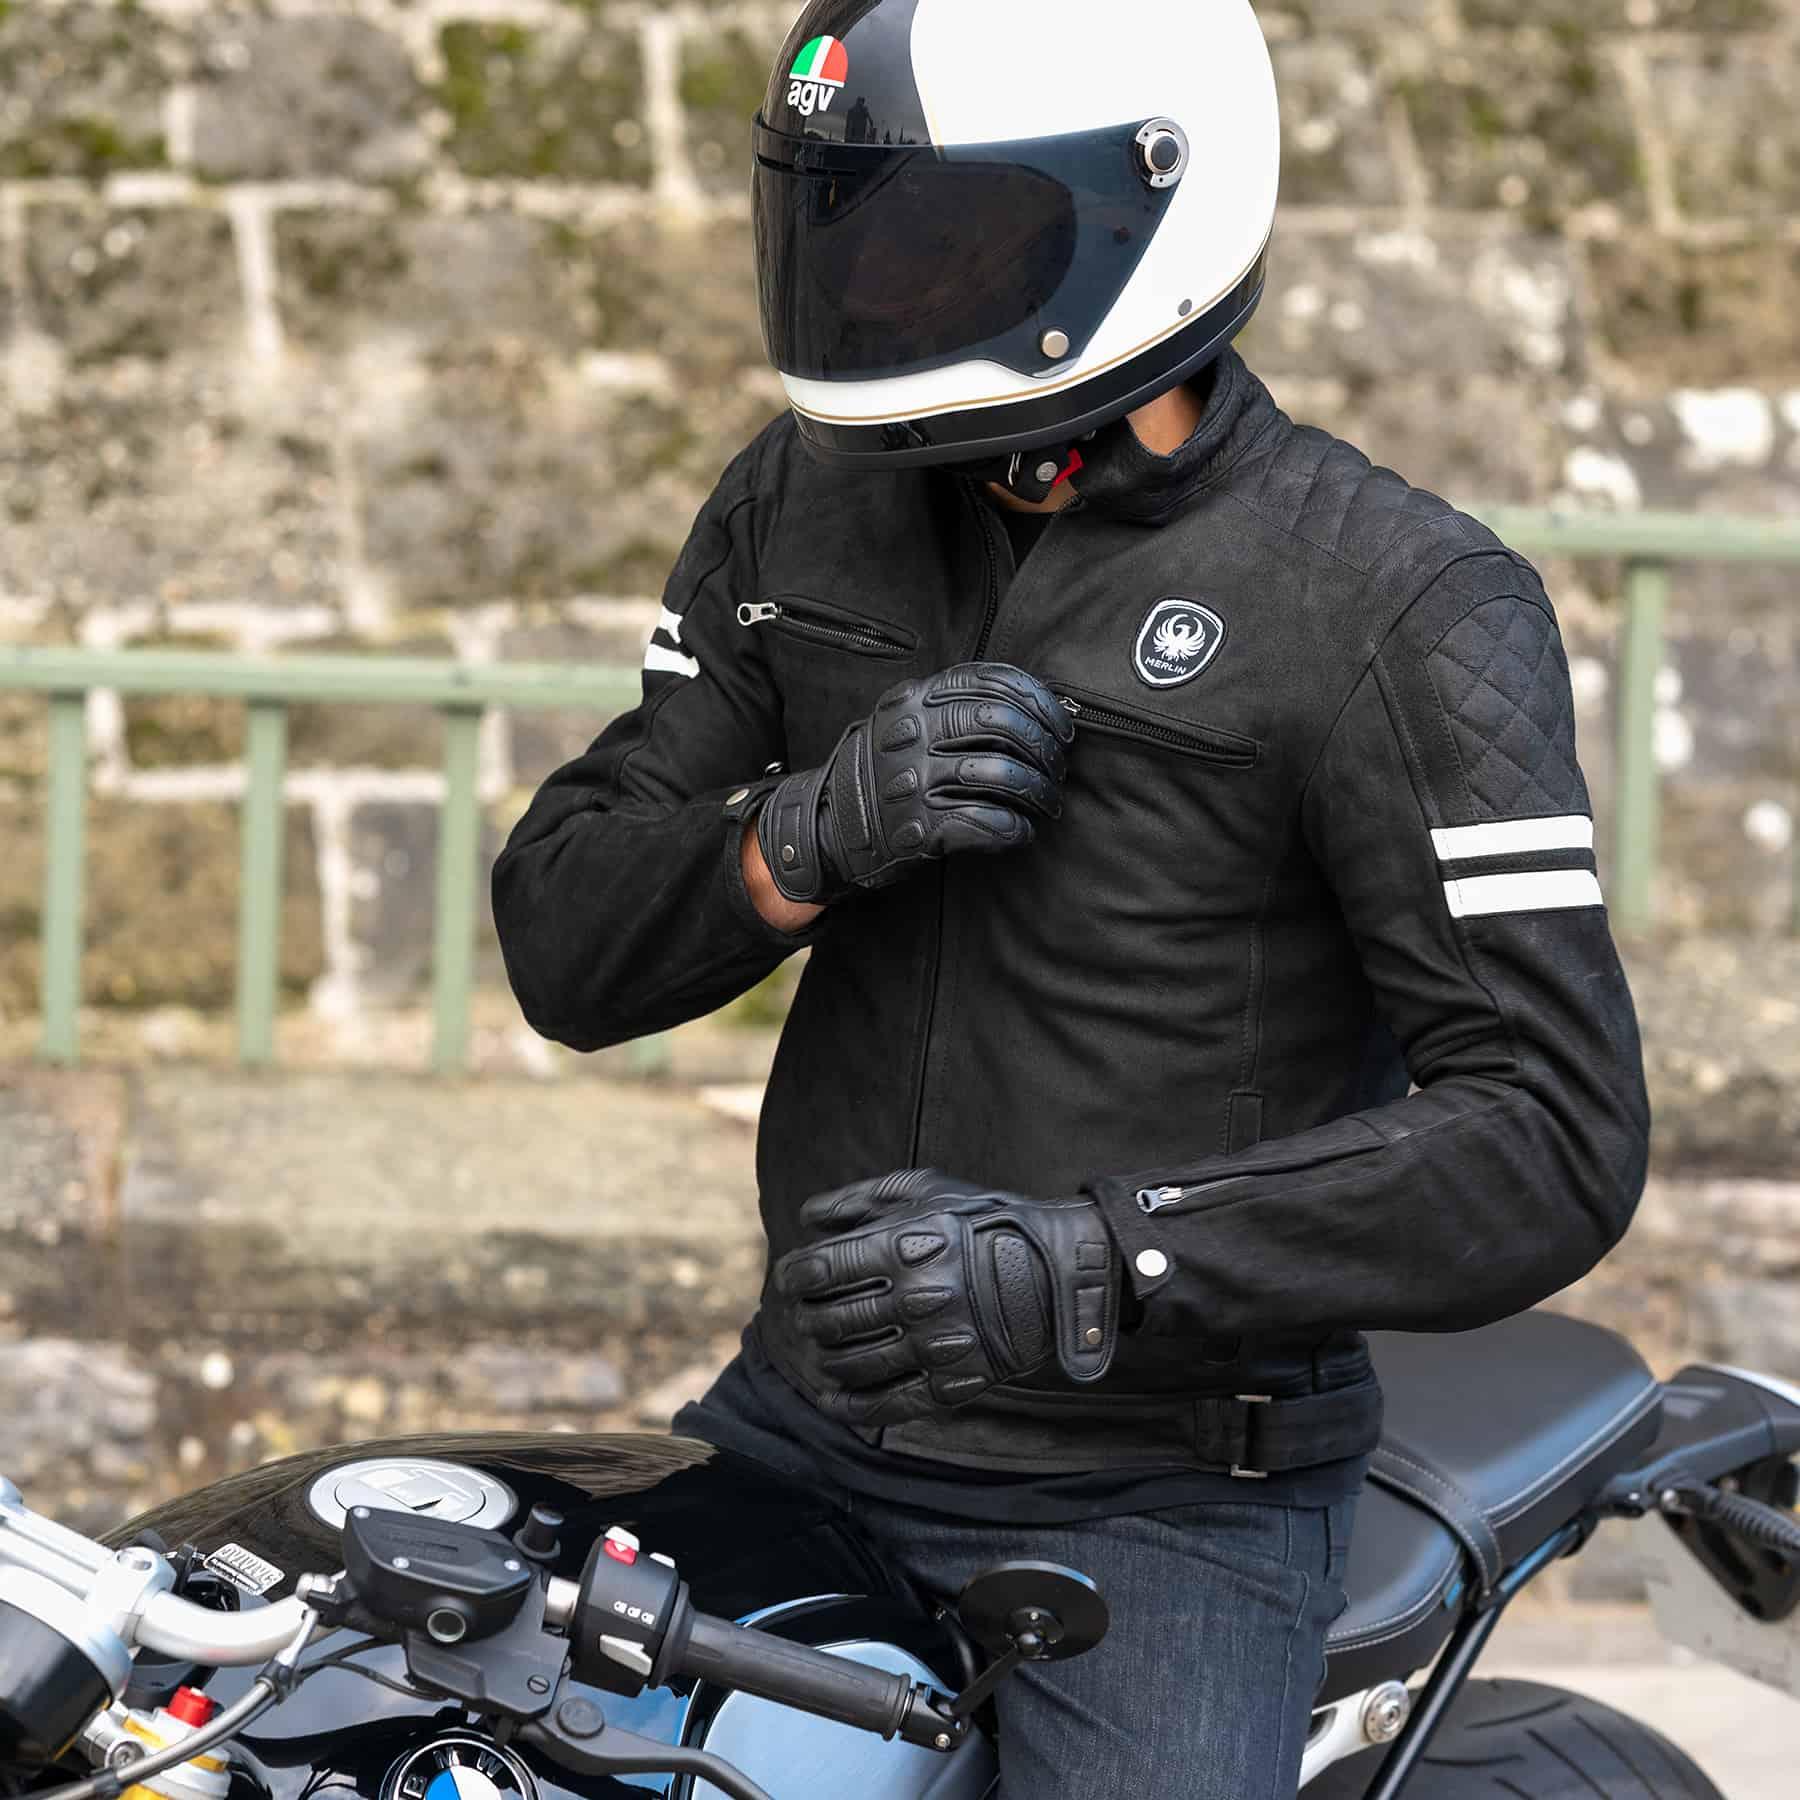 Merlin Hixon leather jacket in black lifestyle image